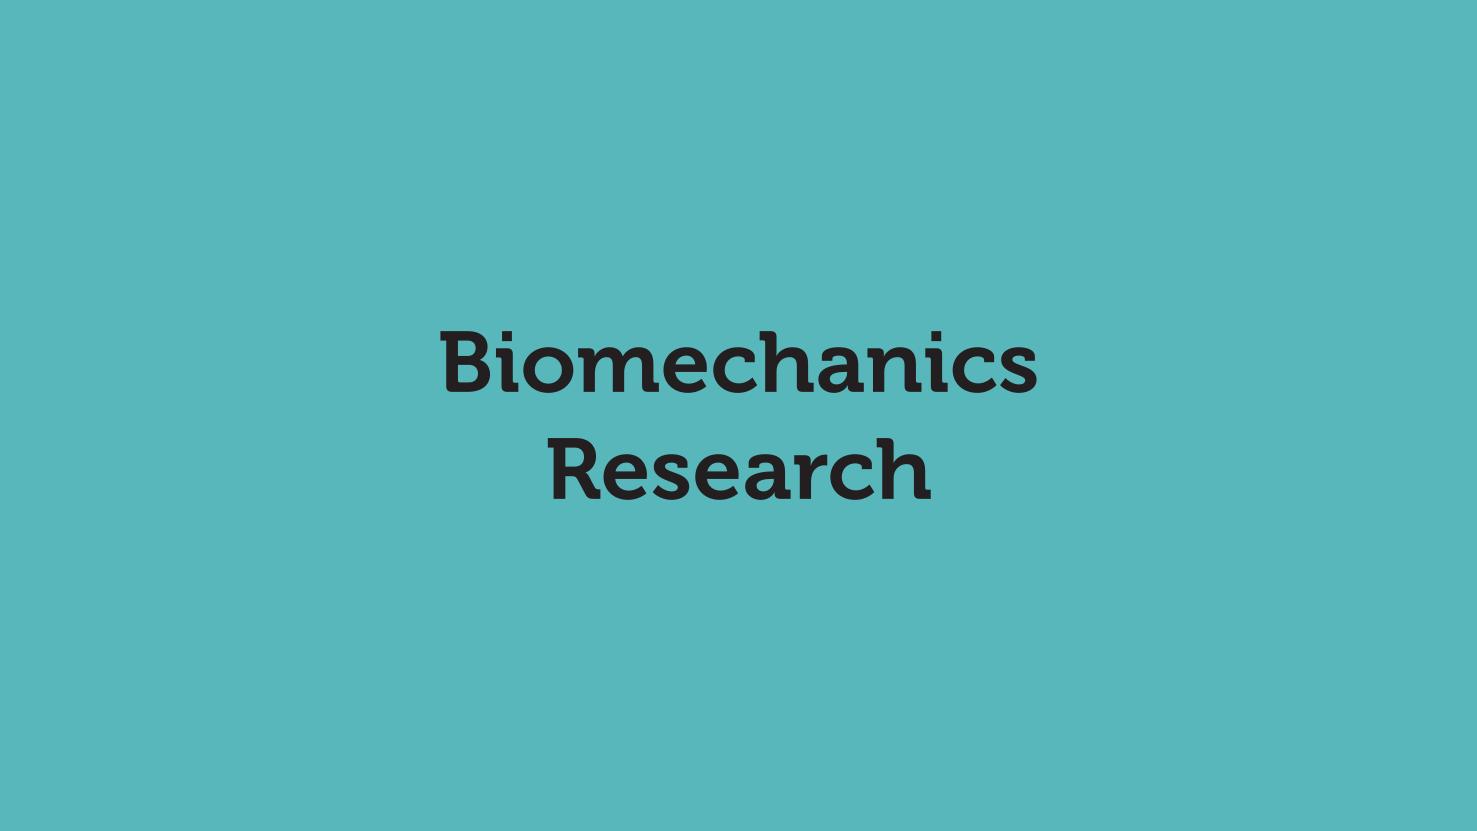 Biomechanics Research